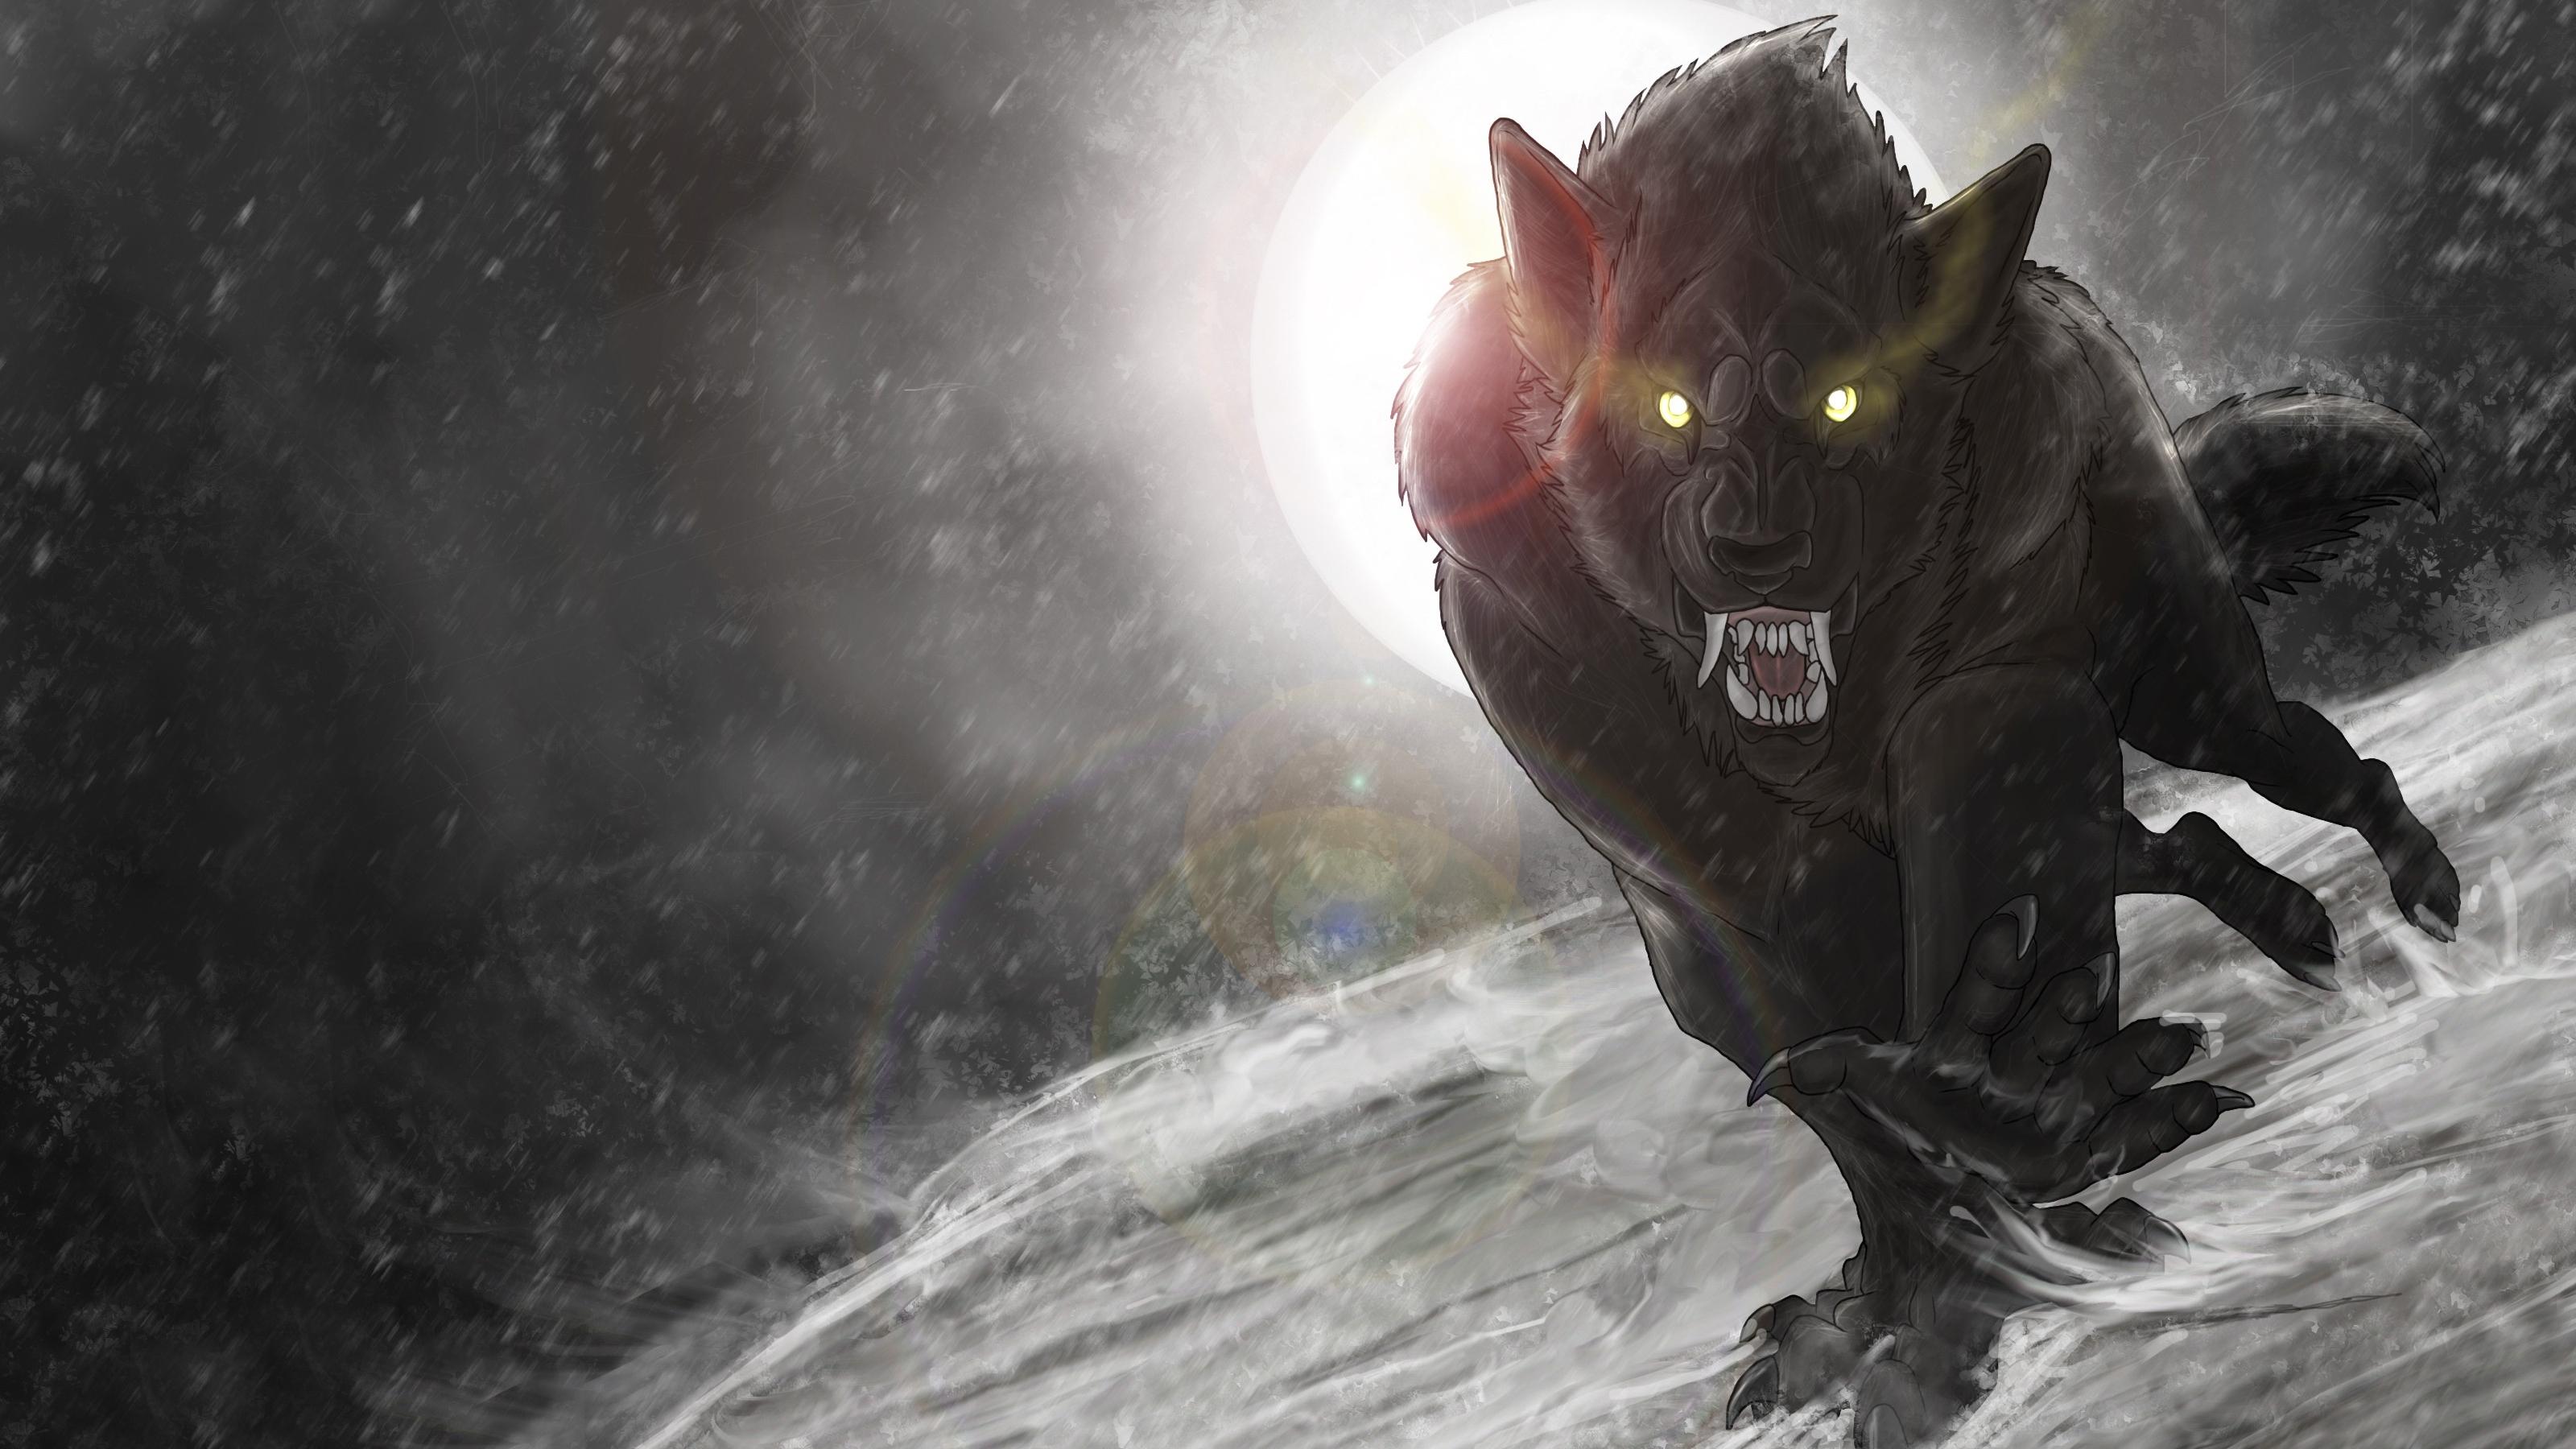 Werewolf Computer Wallpapers, Desktop Backgrounds ...